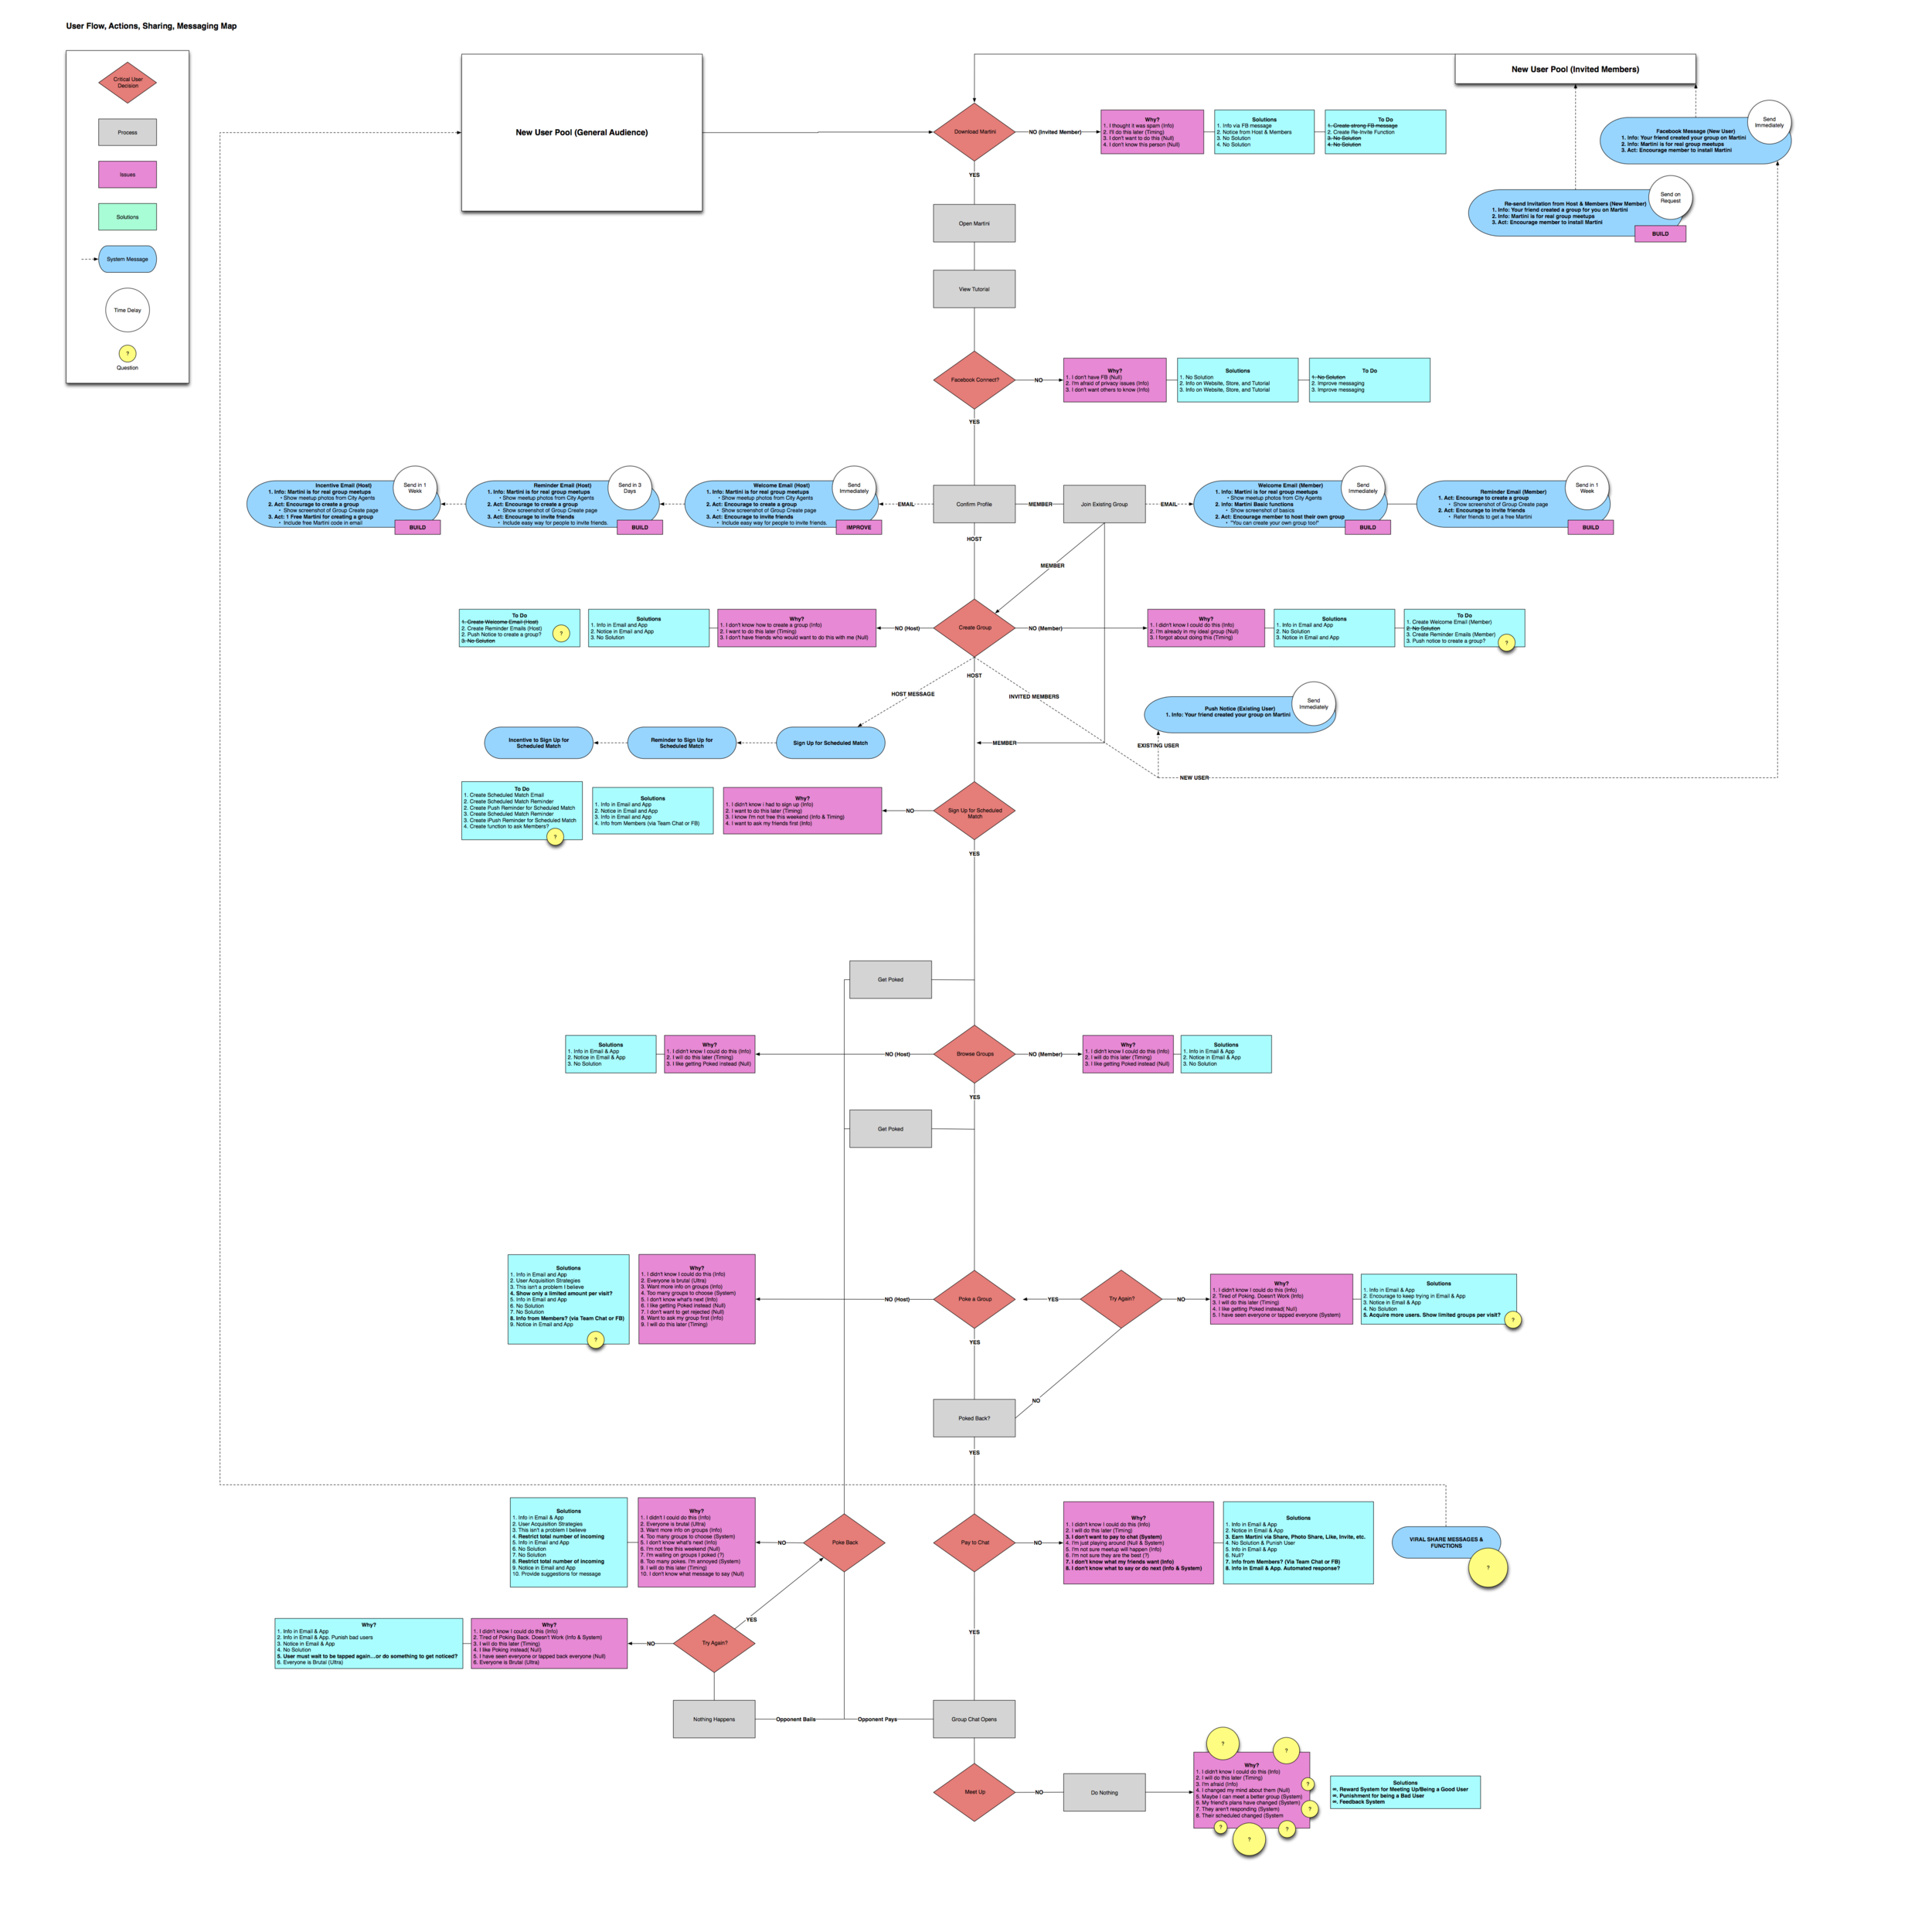 MARTINI User & System Process Map